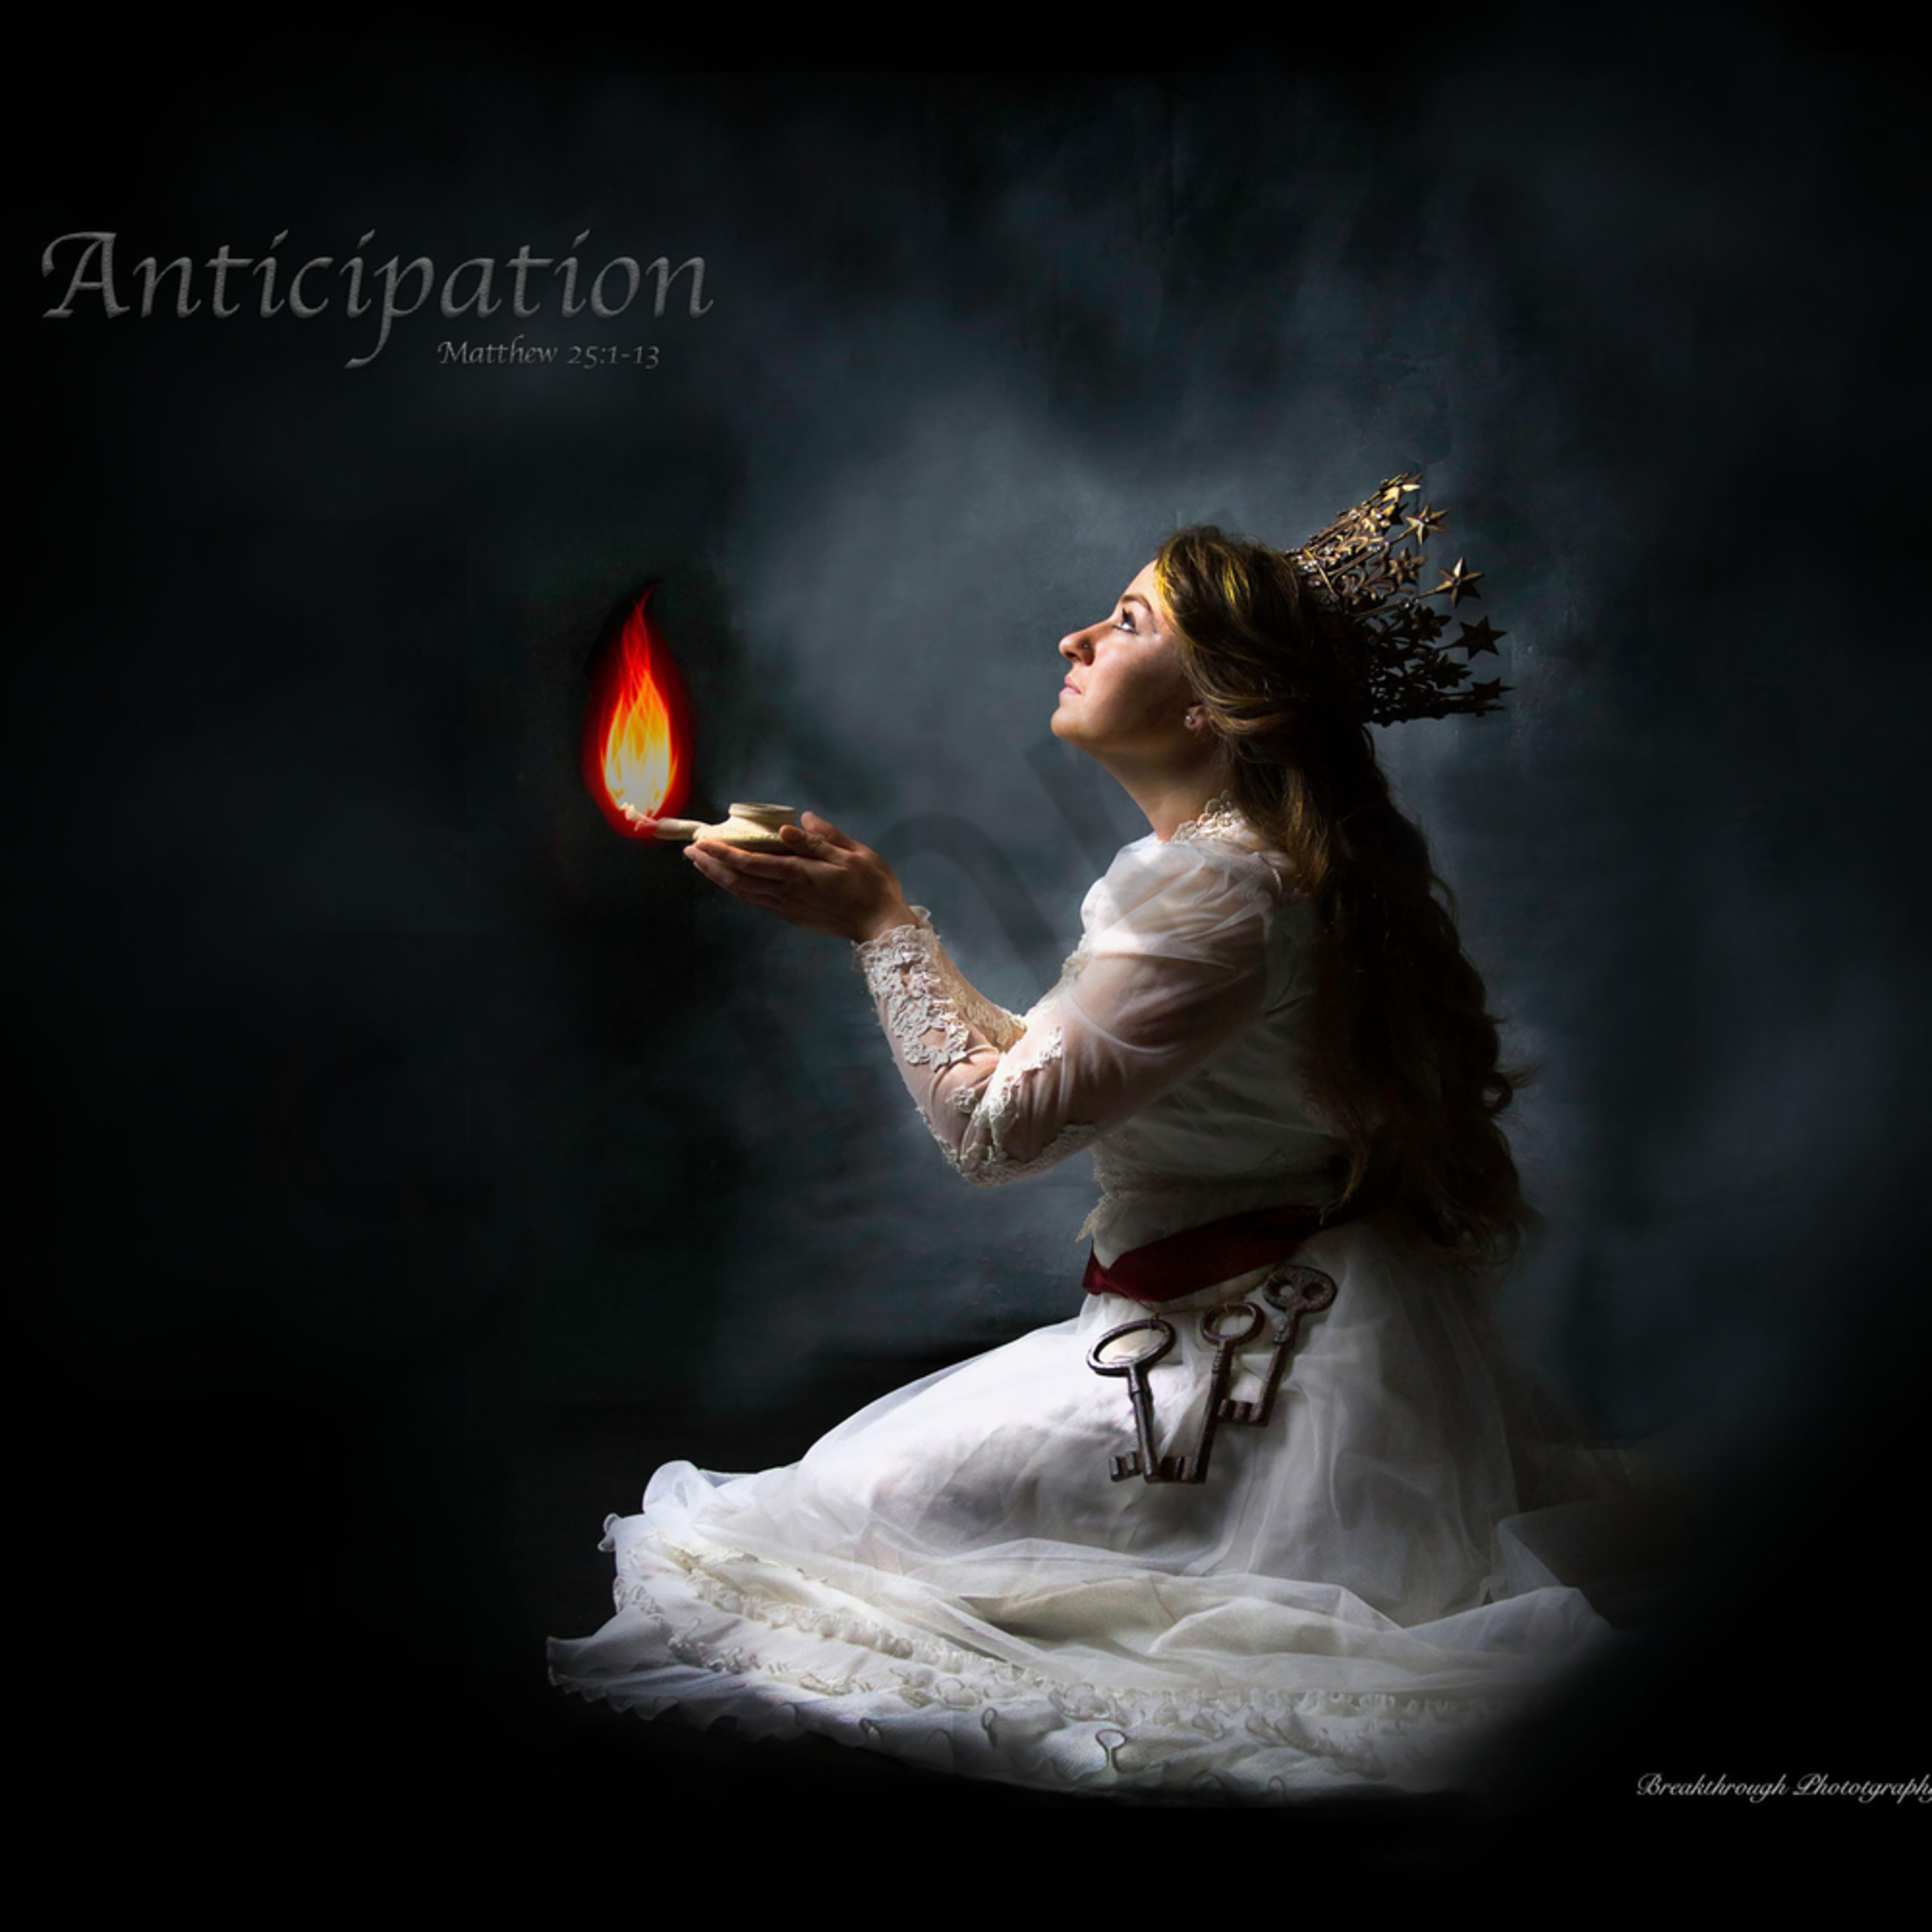 Anticipation by kim fletcher cr3gnt